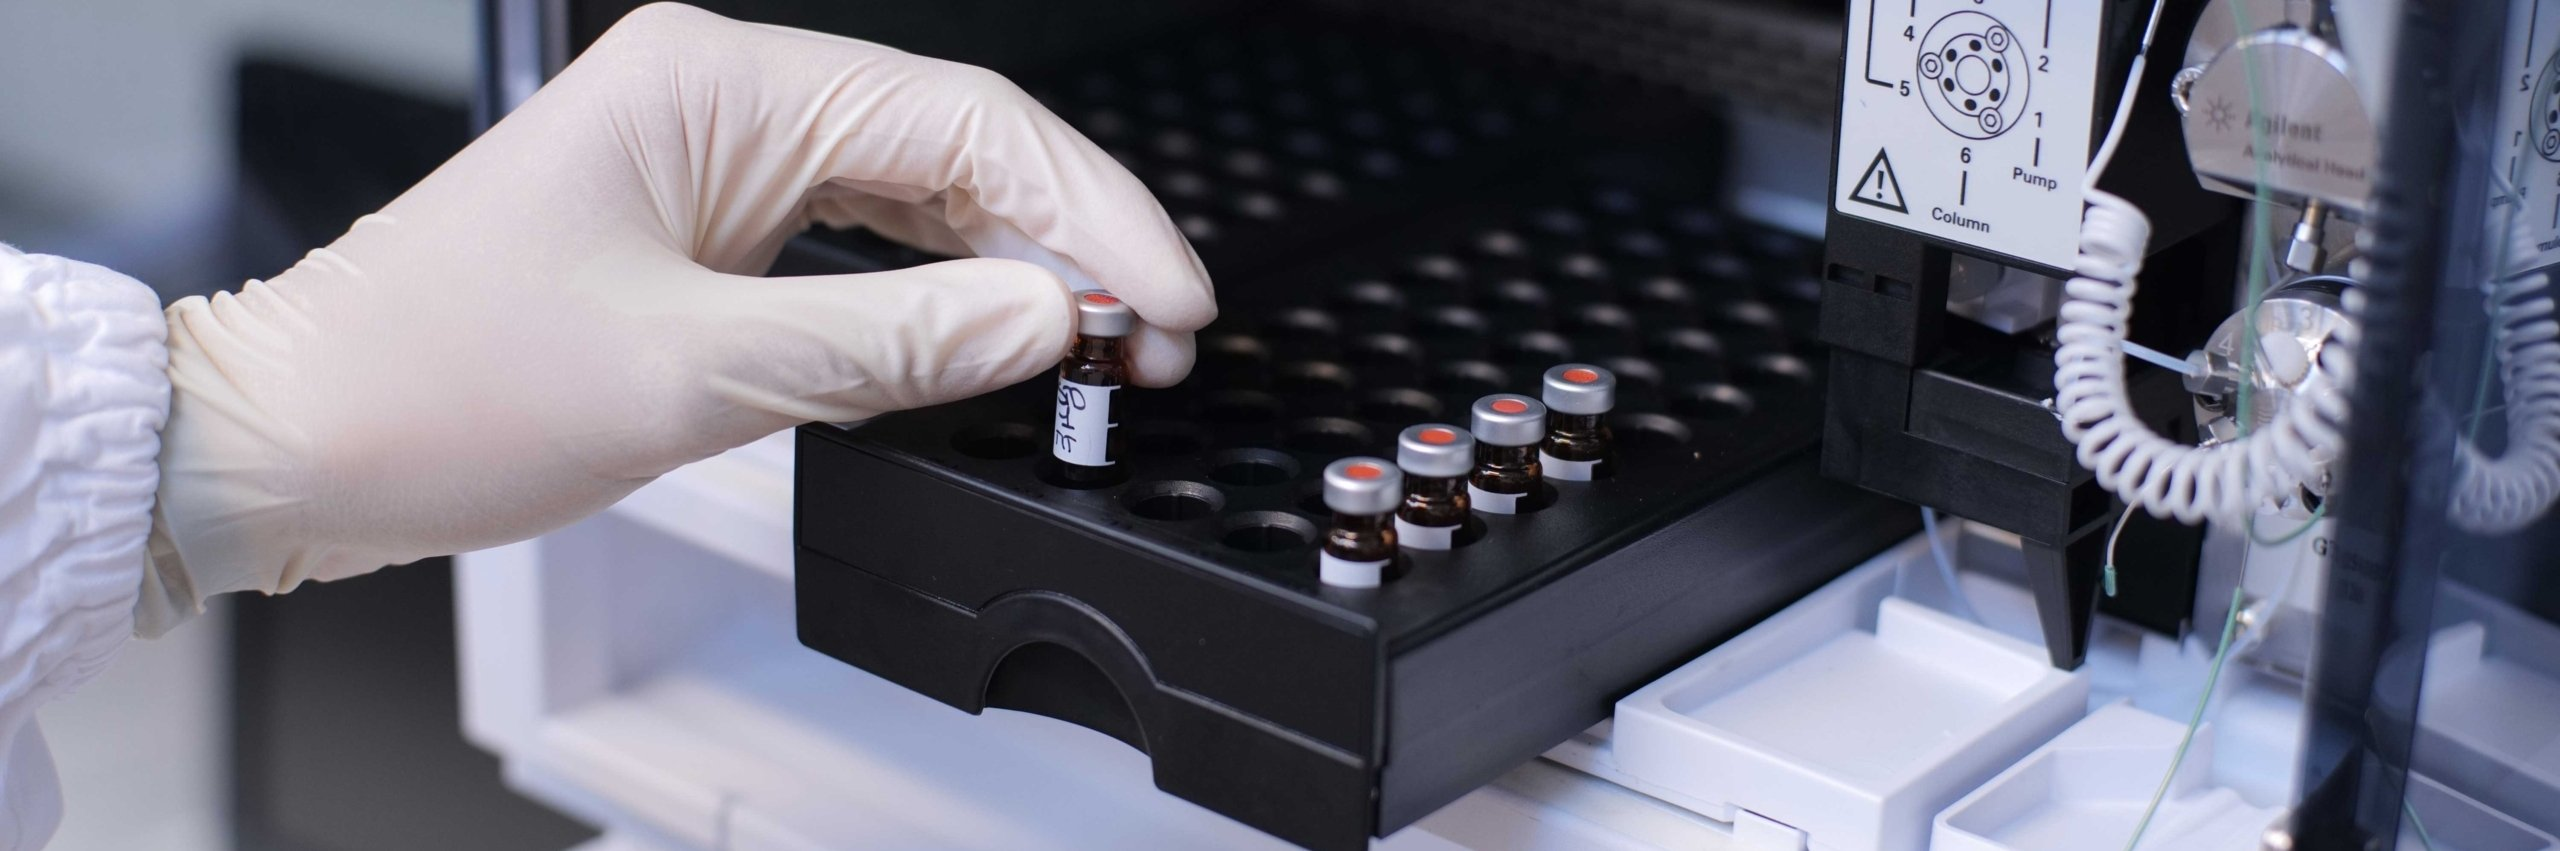 pharmaceutical_machinery